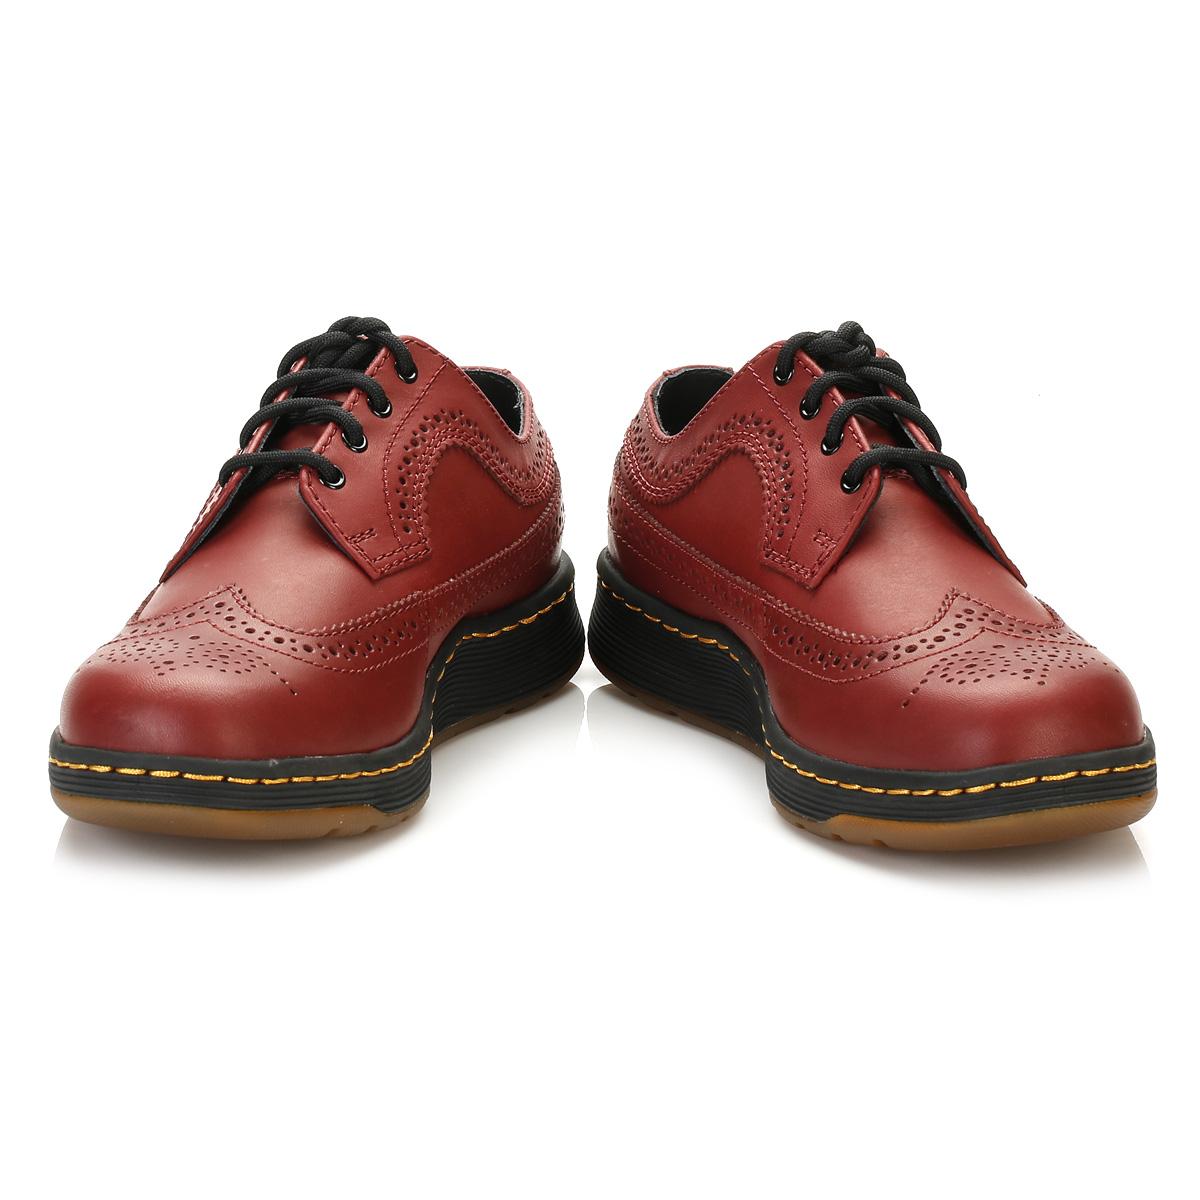 Dr-Martens-Mens-Gabe-Wingtip-Brogue-Shoes-Black-